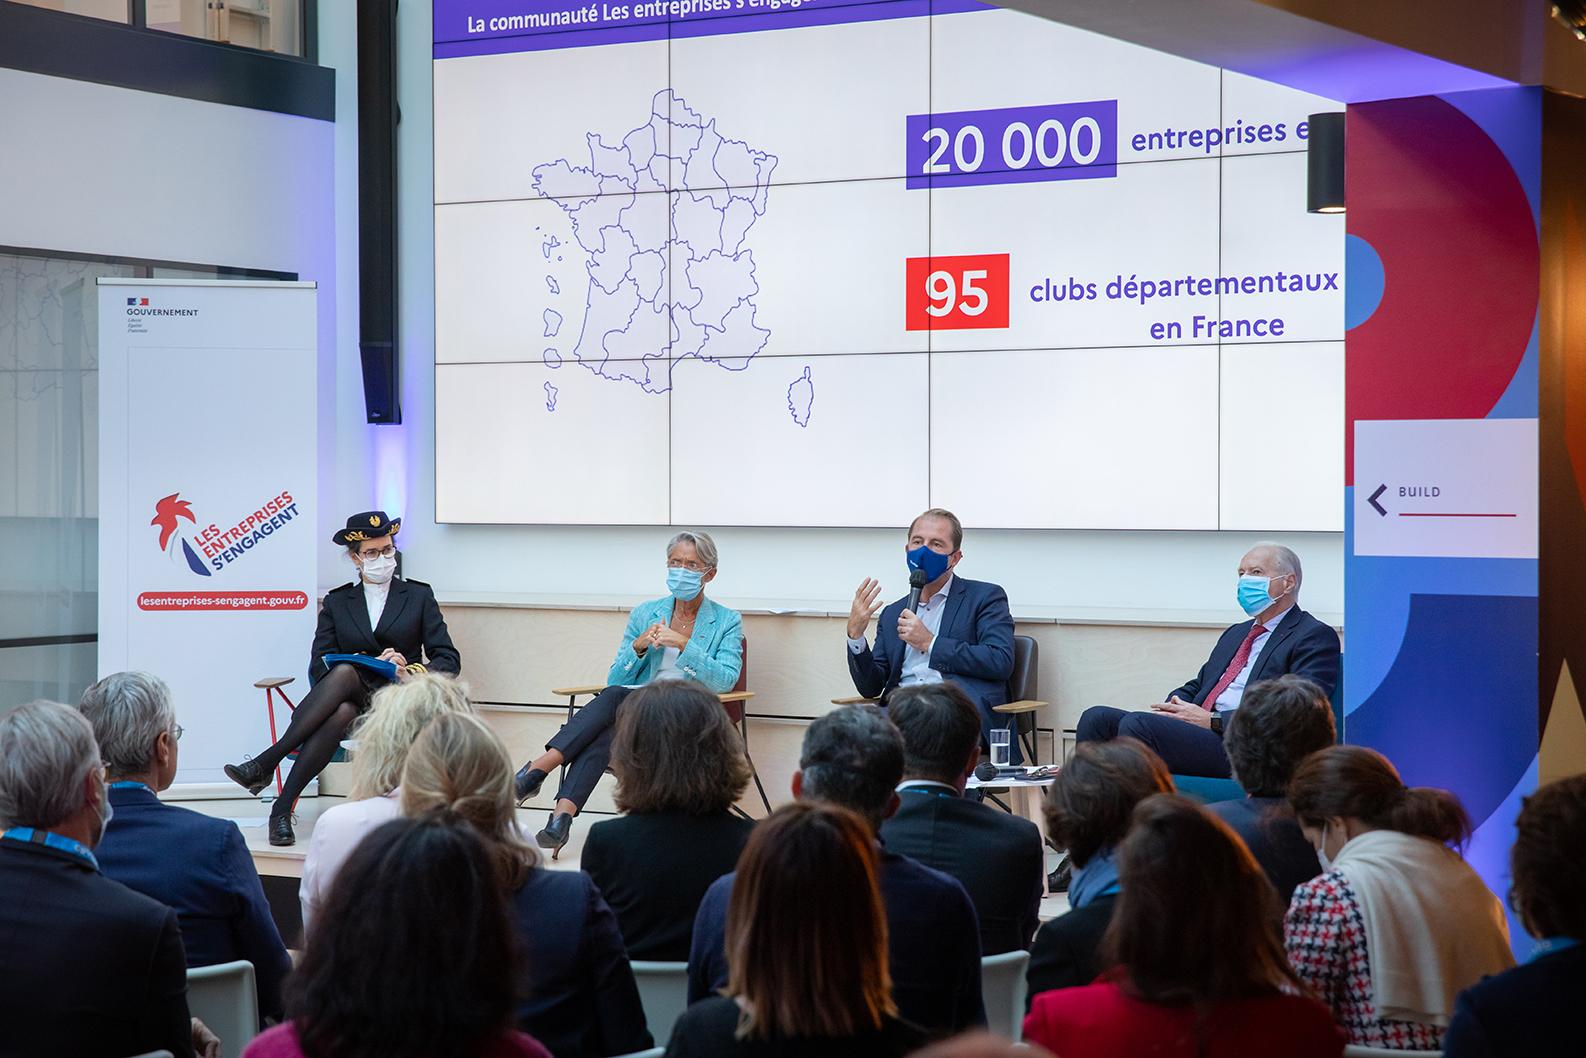 "The new ambitions of the ""Les entreprises s'engagent"" community at Leonard:Paris"